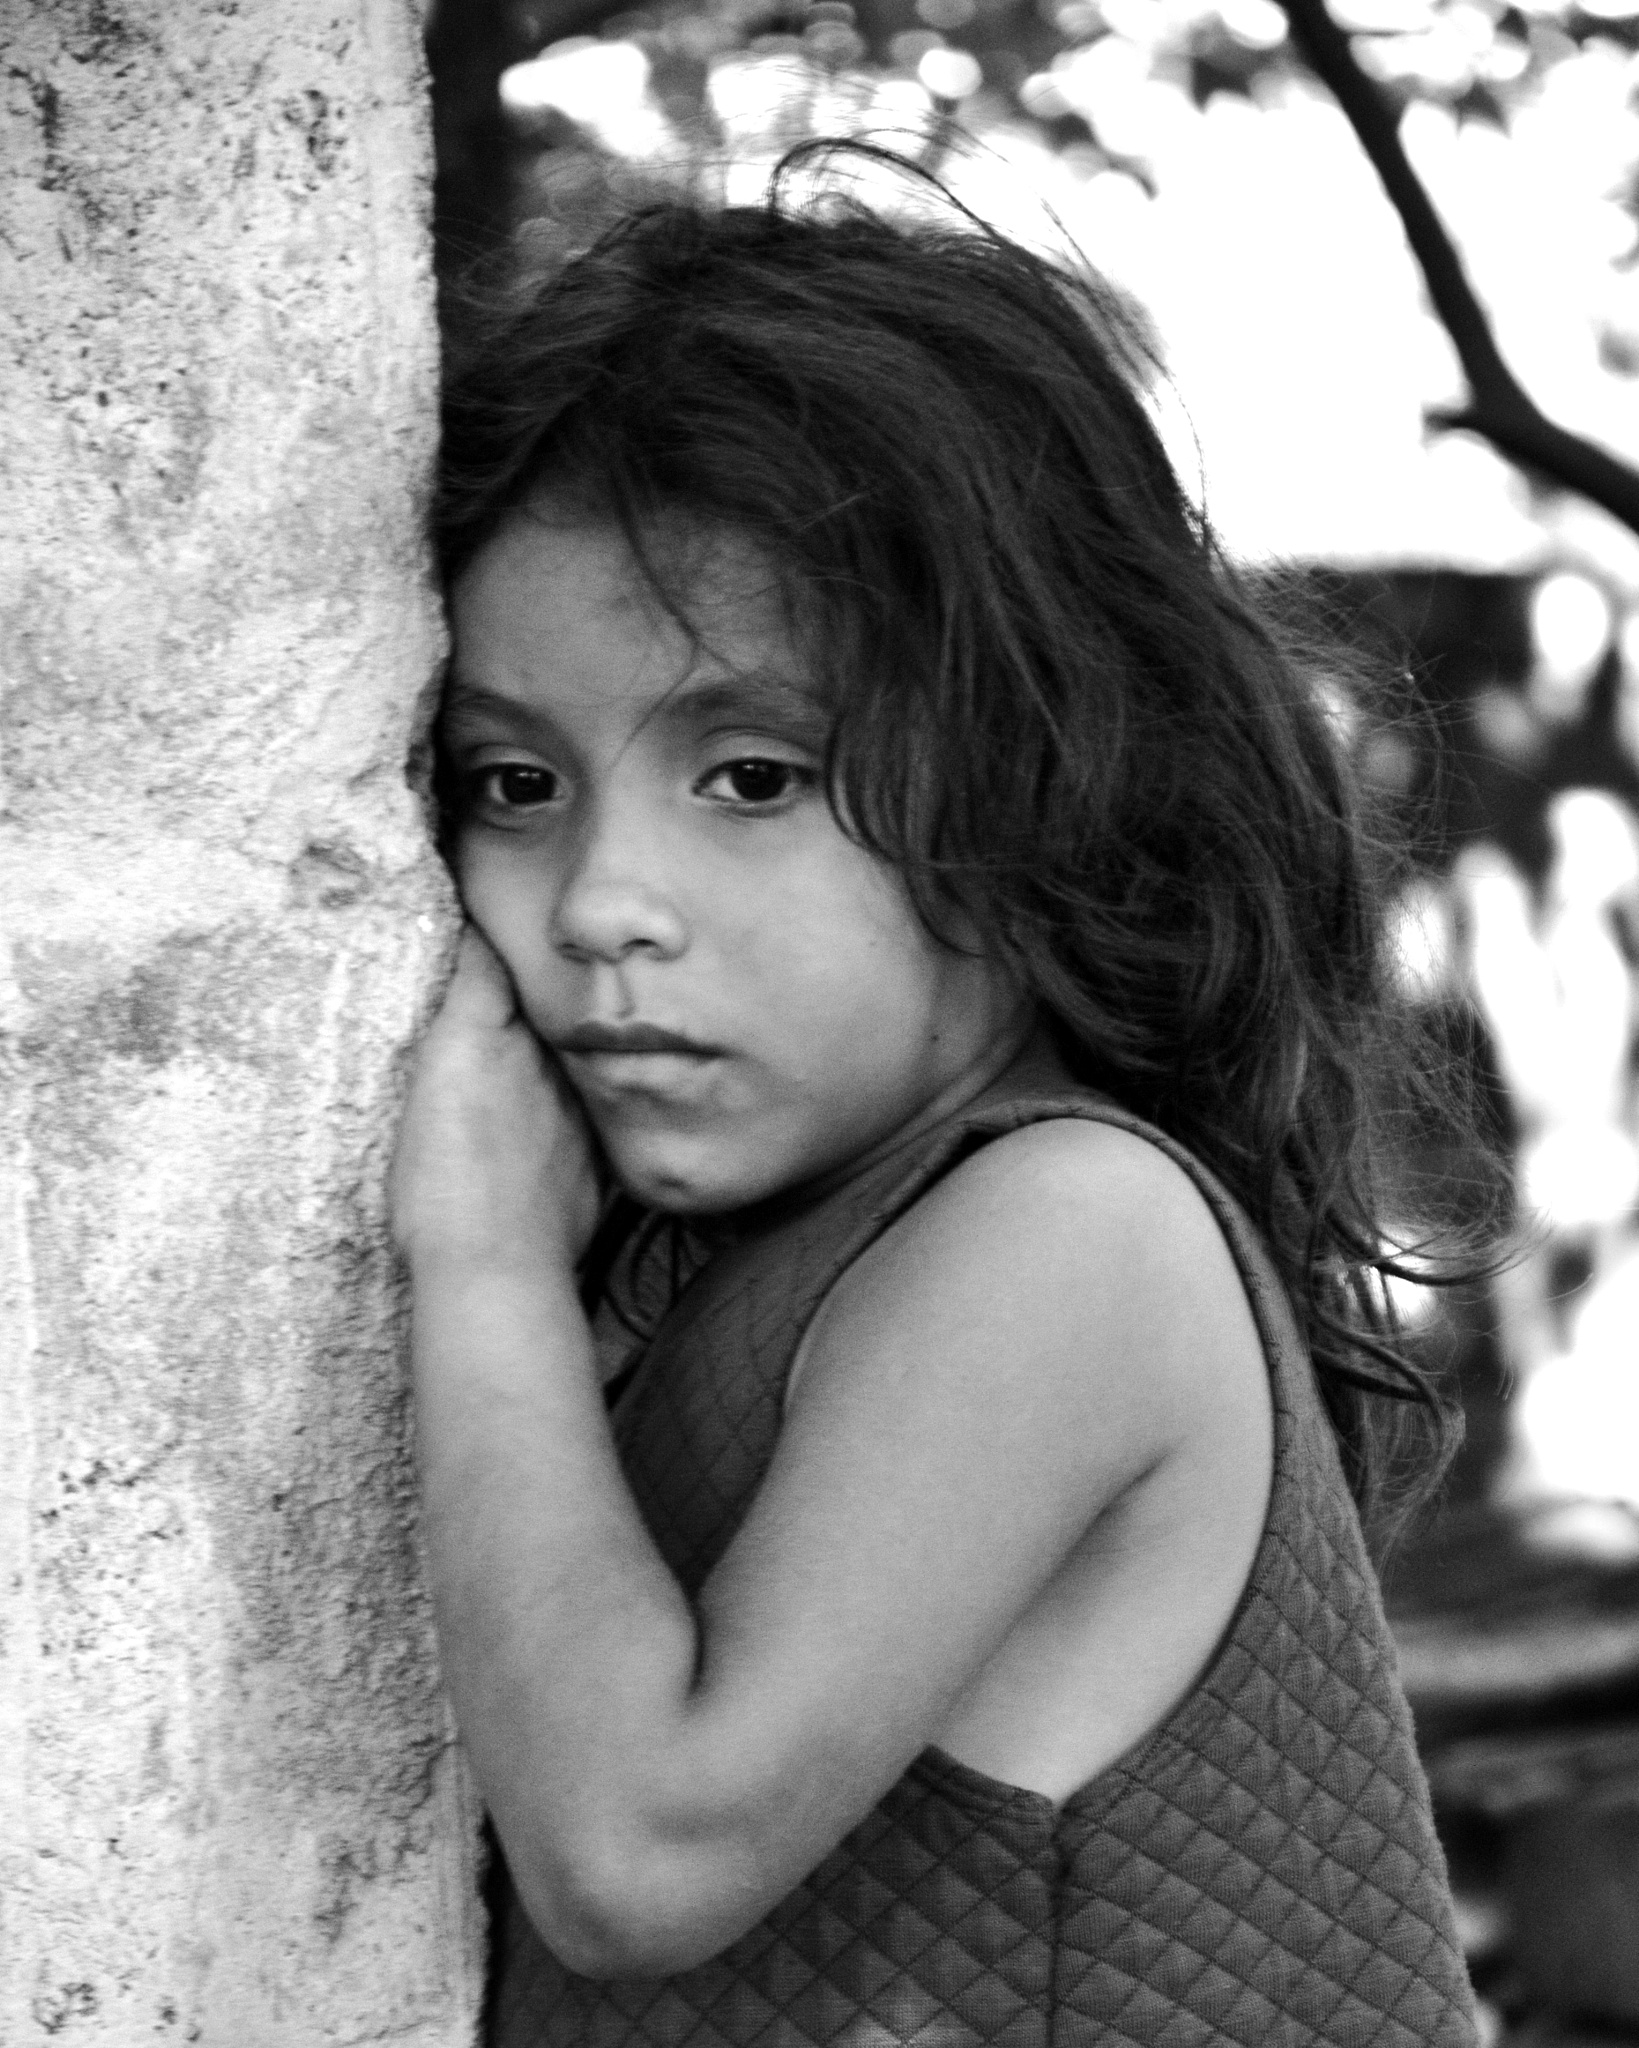 Yamara 1 by Ives Martinez